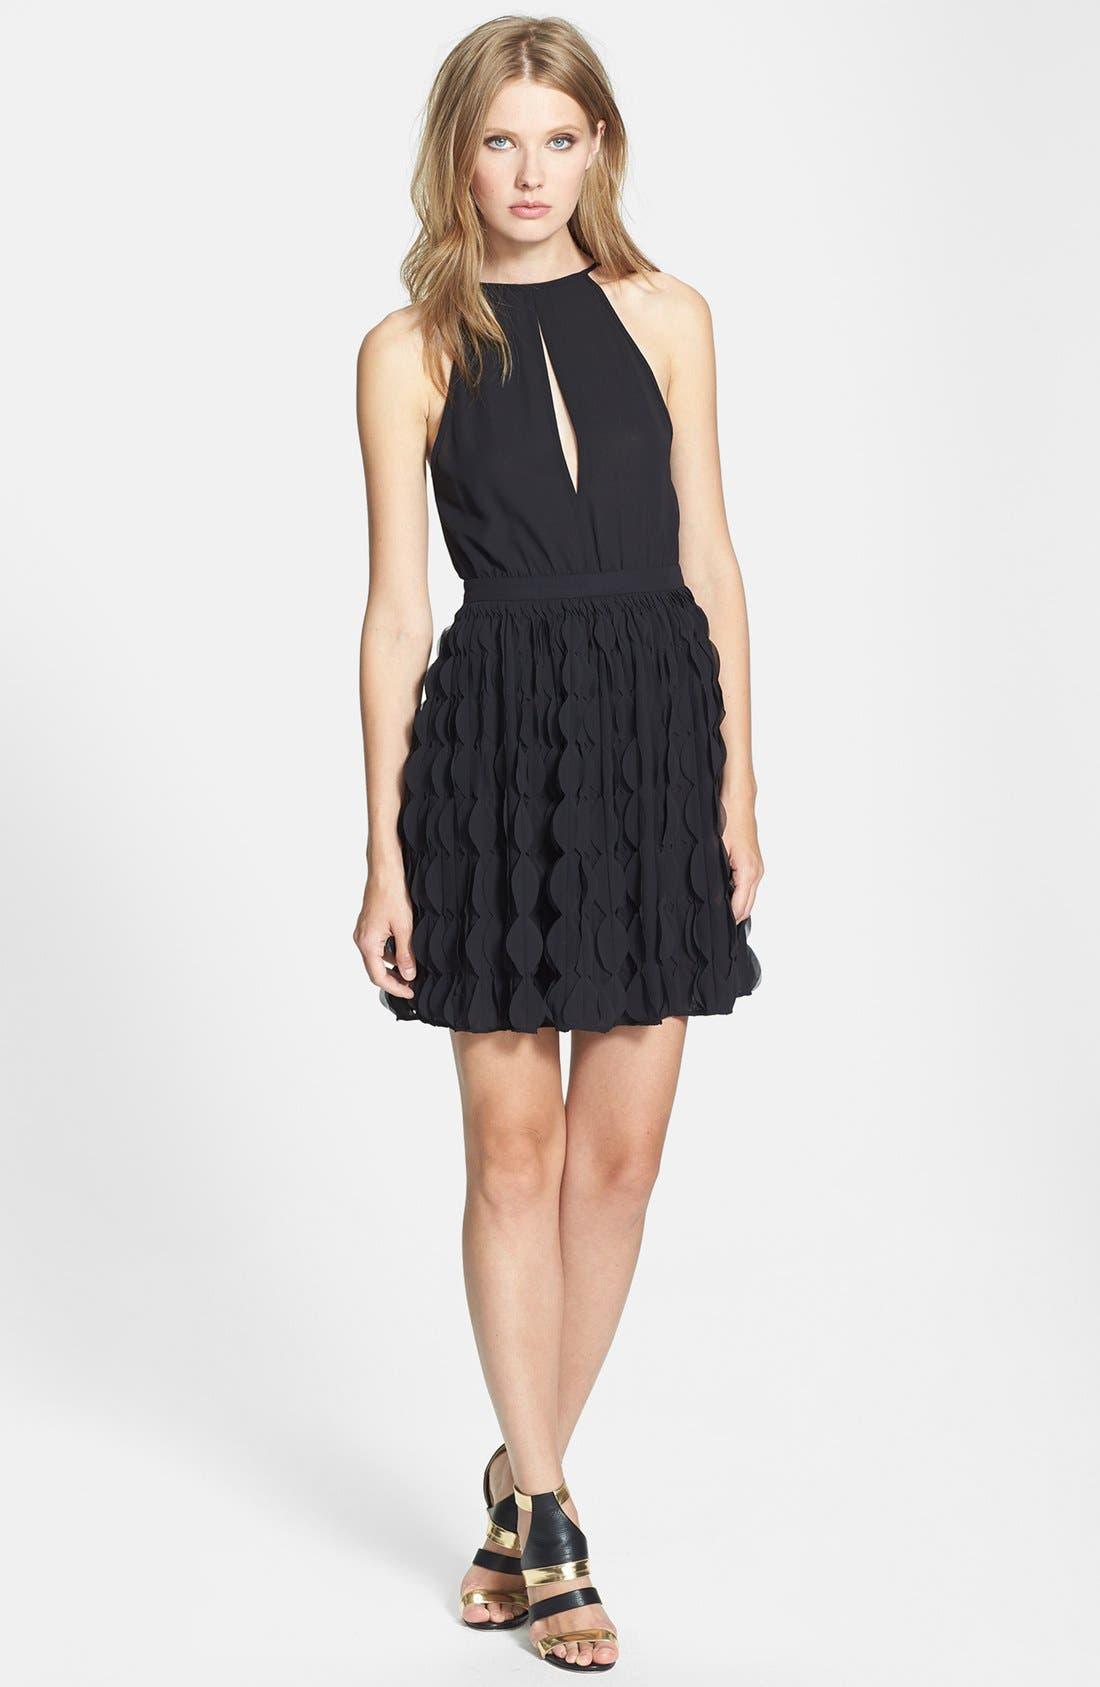 Alternate Image 1 Selected - Diane von Furstenberg 'Gia' Ruffle Skirt Fit & Flare Dress